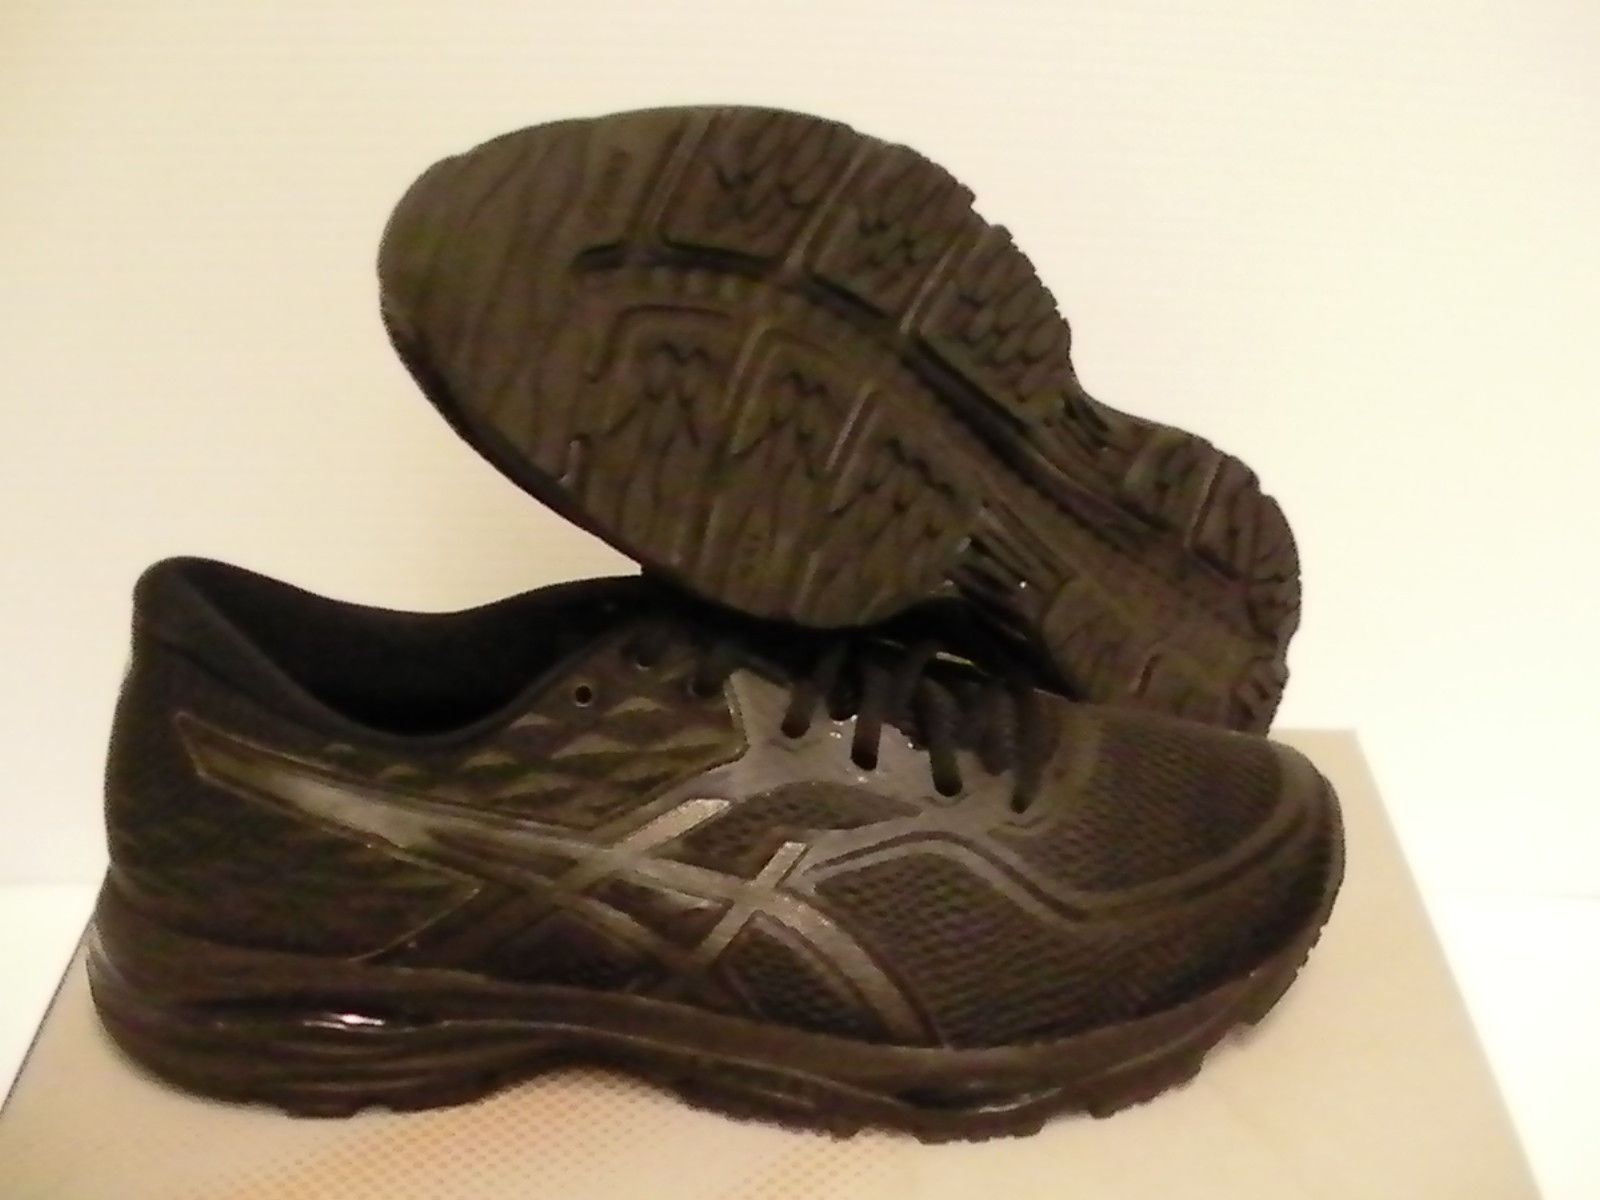 newest 2b814 6c4b2 Asics gel cumulus 19 running shoes black and 28 similar items. S l1600